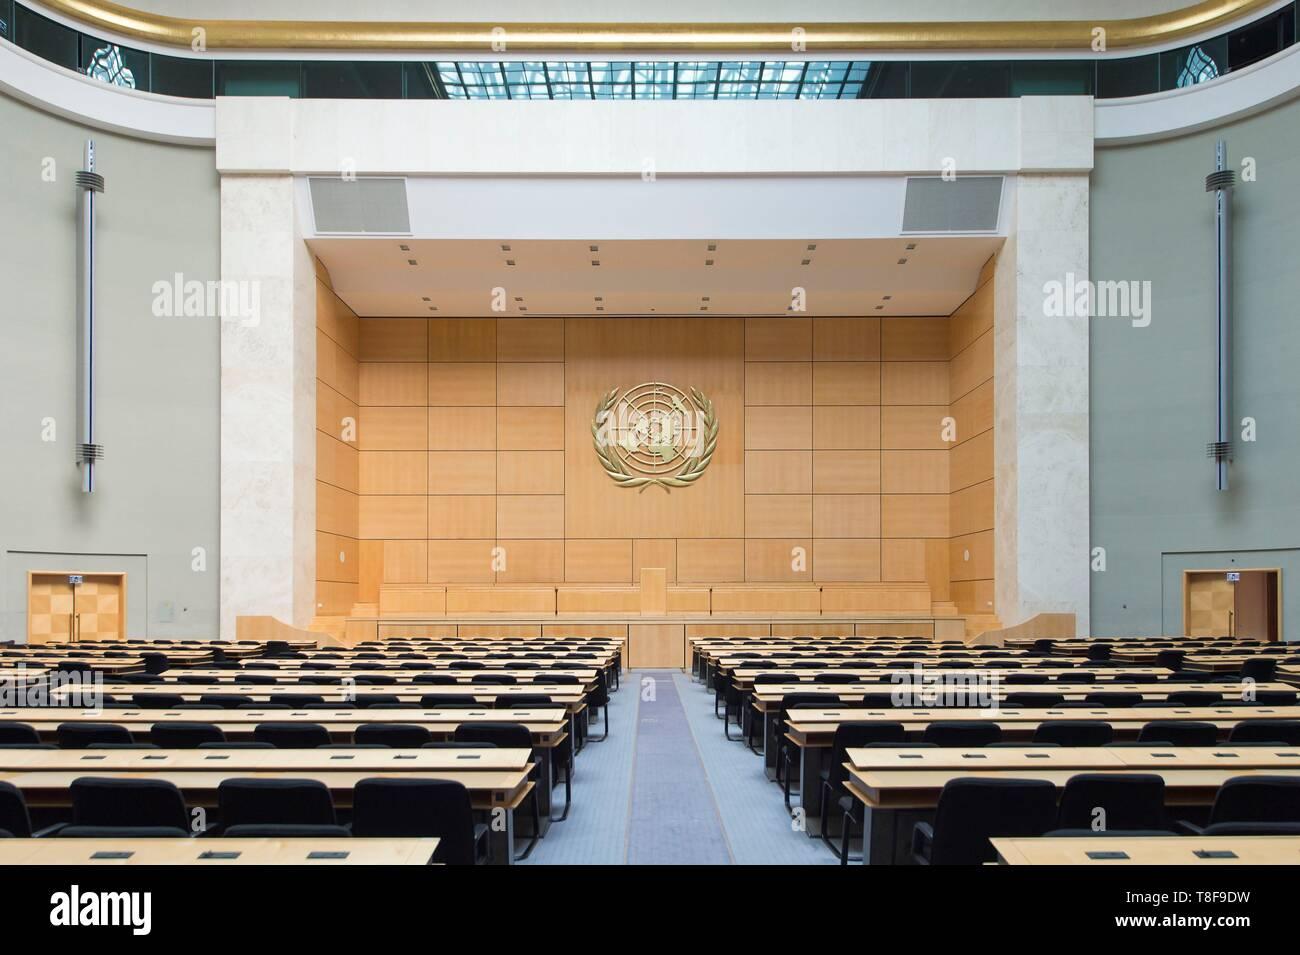 Switzerland, Geneva, Swiss Confederation, in the United Nations Palace, United Nations Organization, Hall of Assemblies - Stock Image